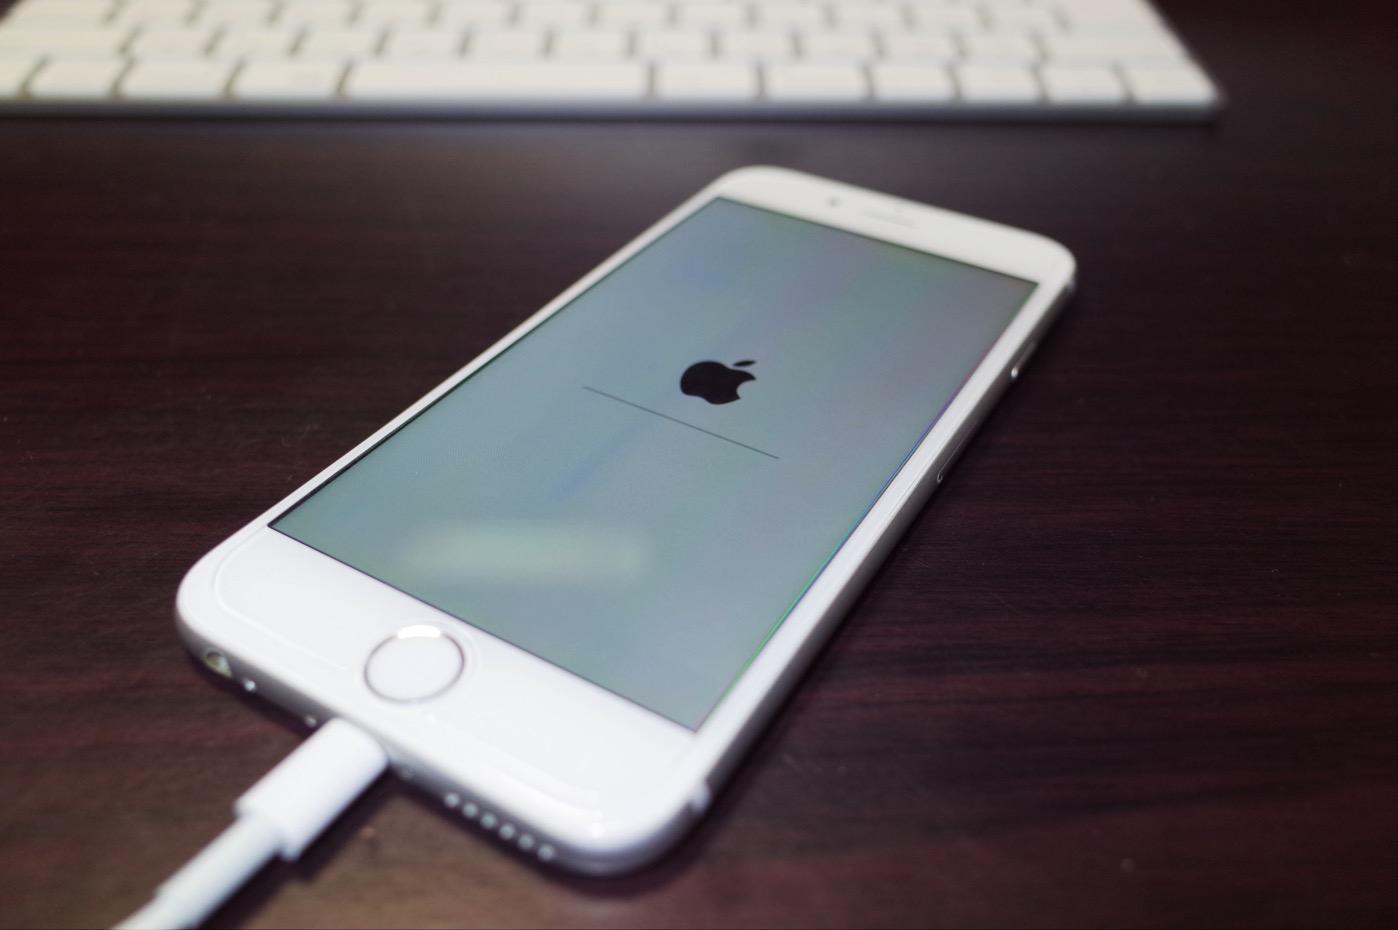 [iPhone] iOS 10へのアップデート失敗!iPhone 6が文鎮化して焦りまくりの一日